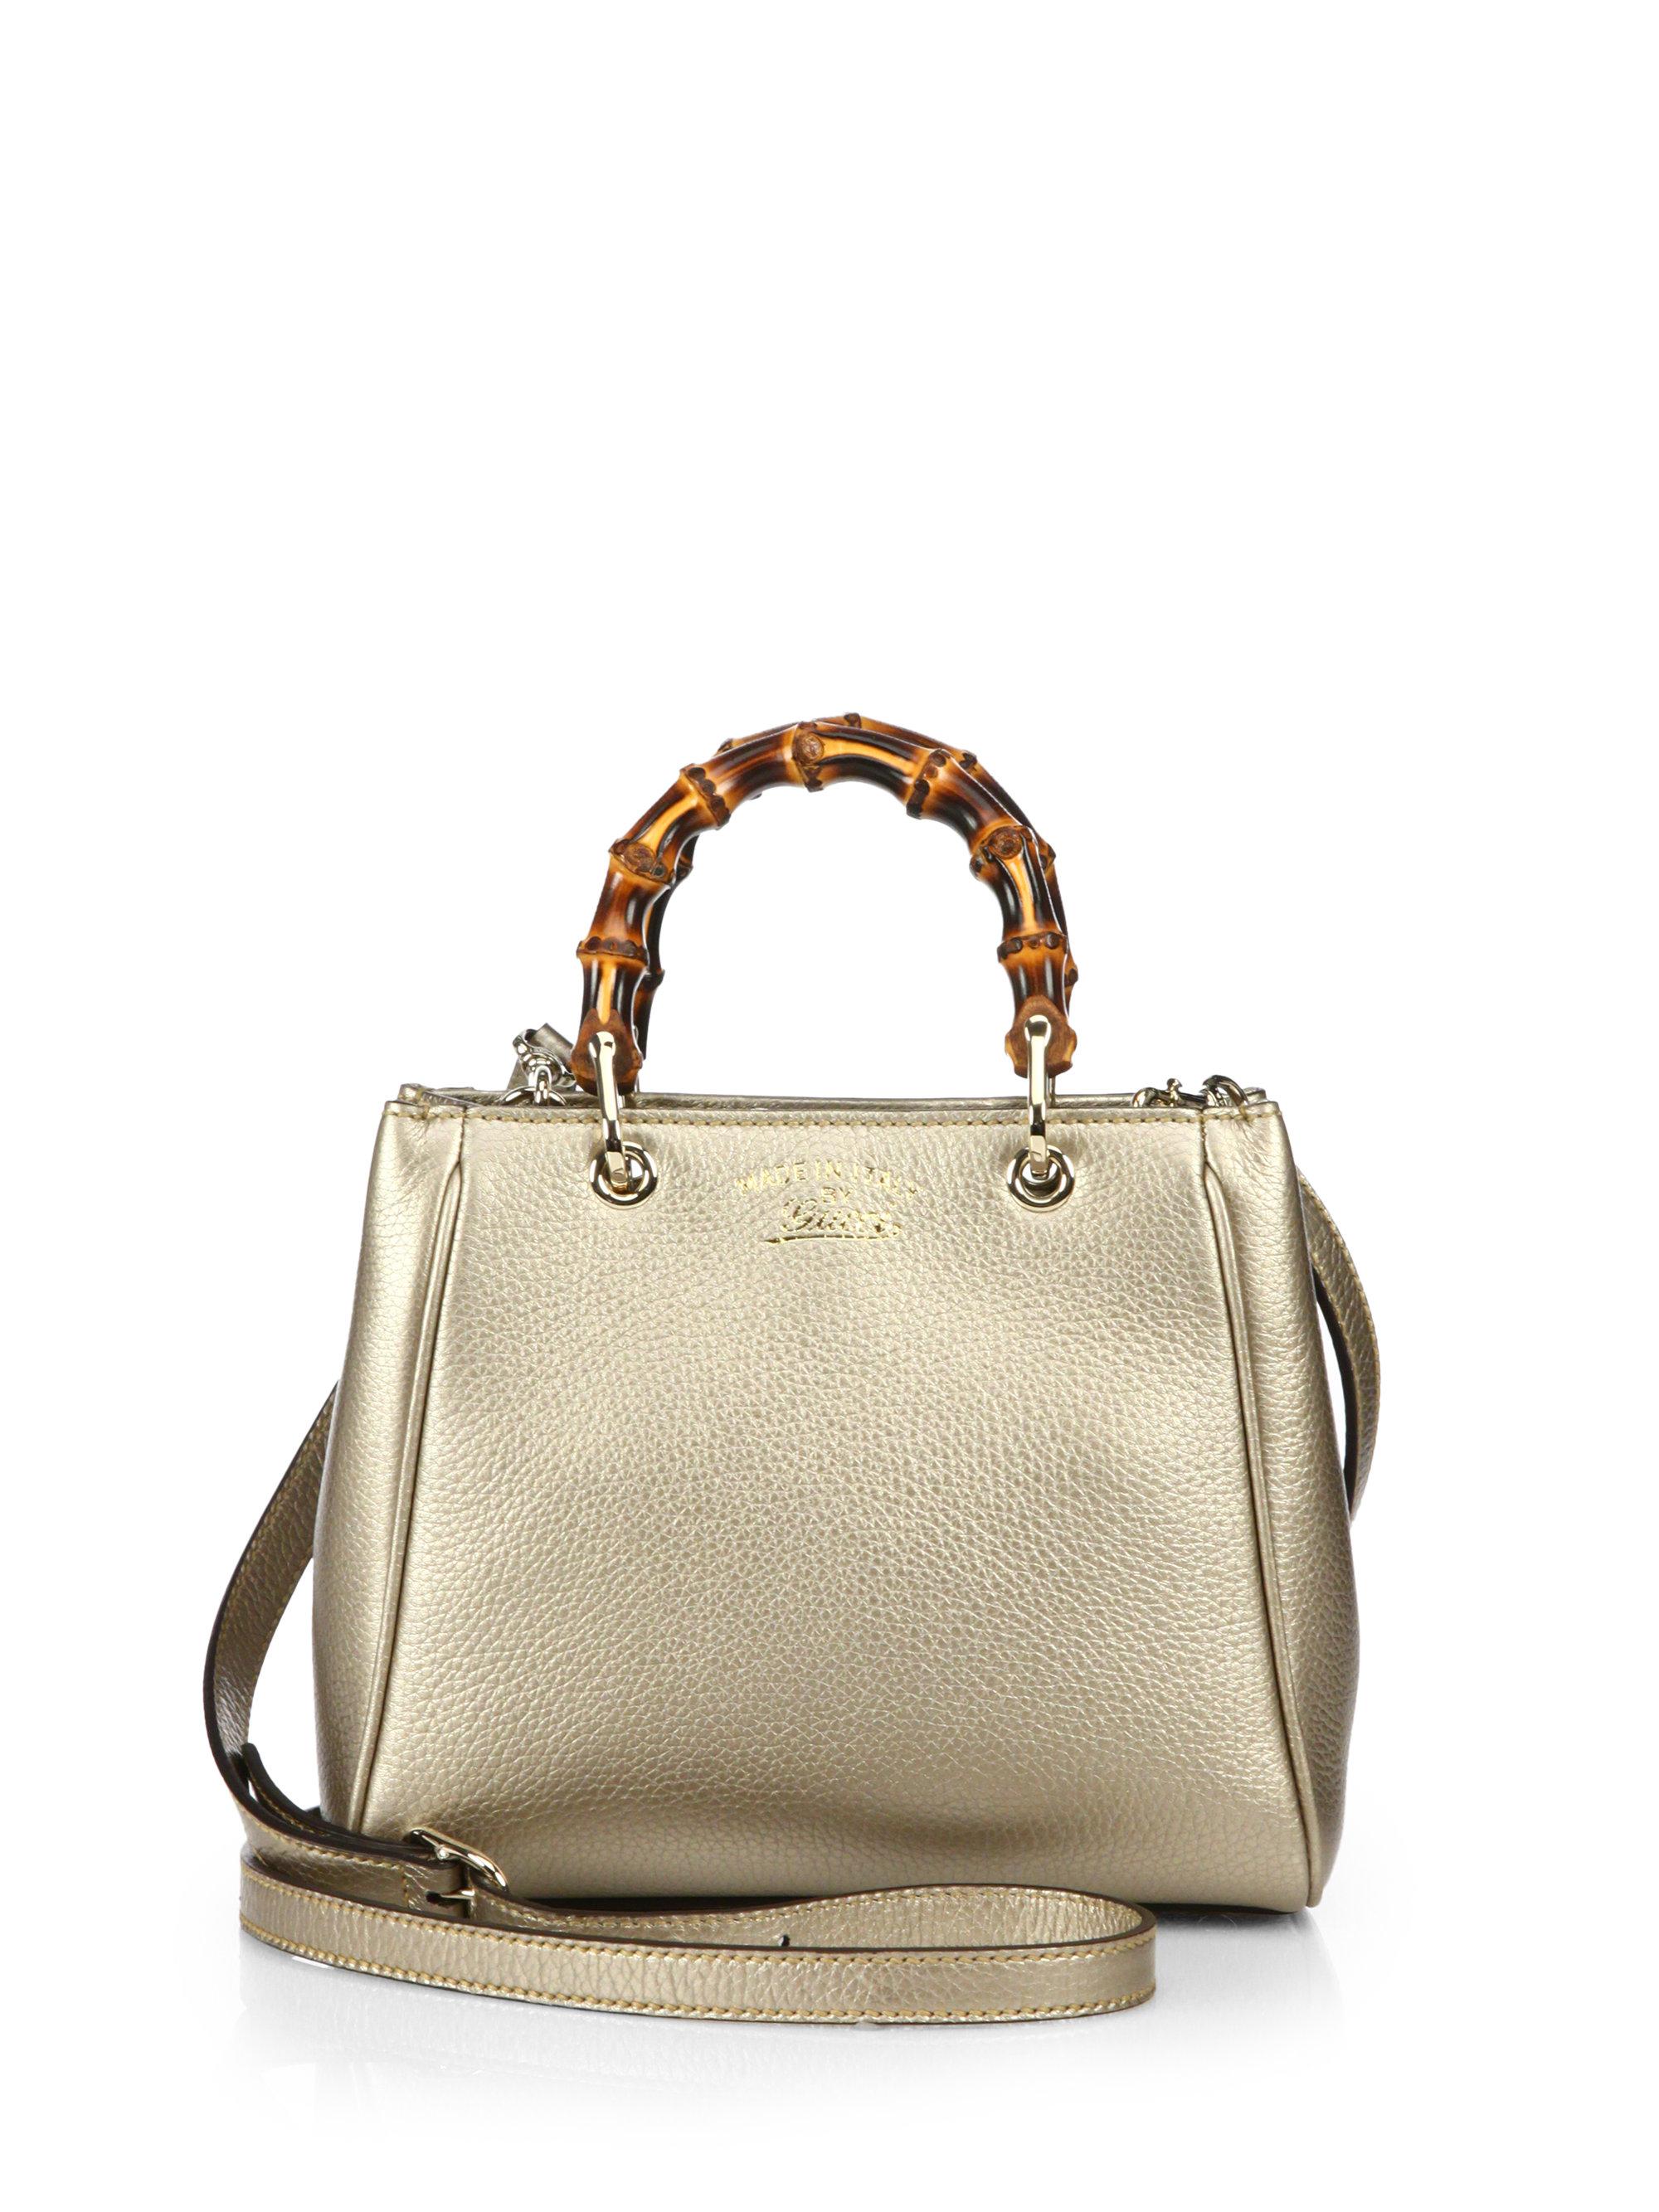 a64aba81331 Lyst - Gucci Bamboo Shopper Mini Leather Top Handle Bag in Metallic